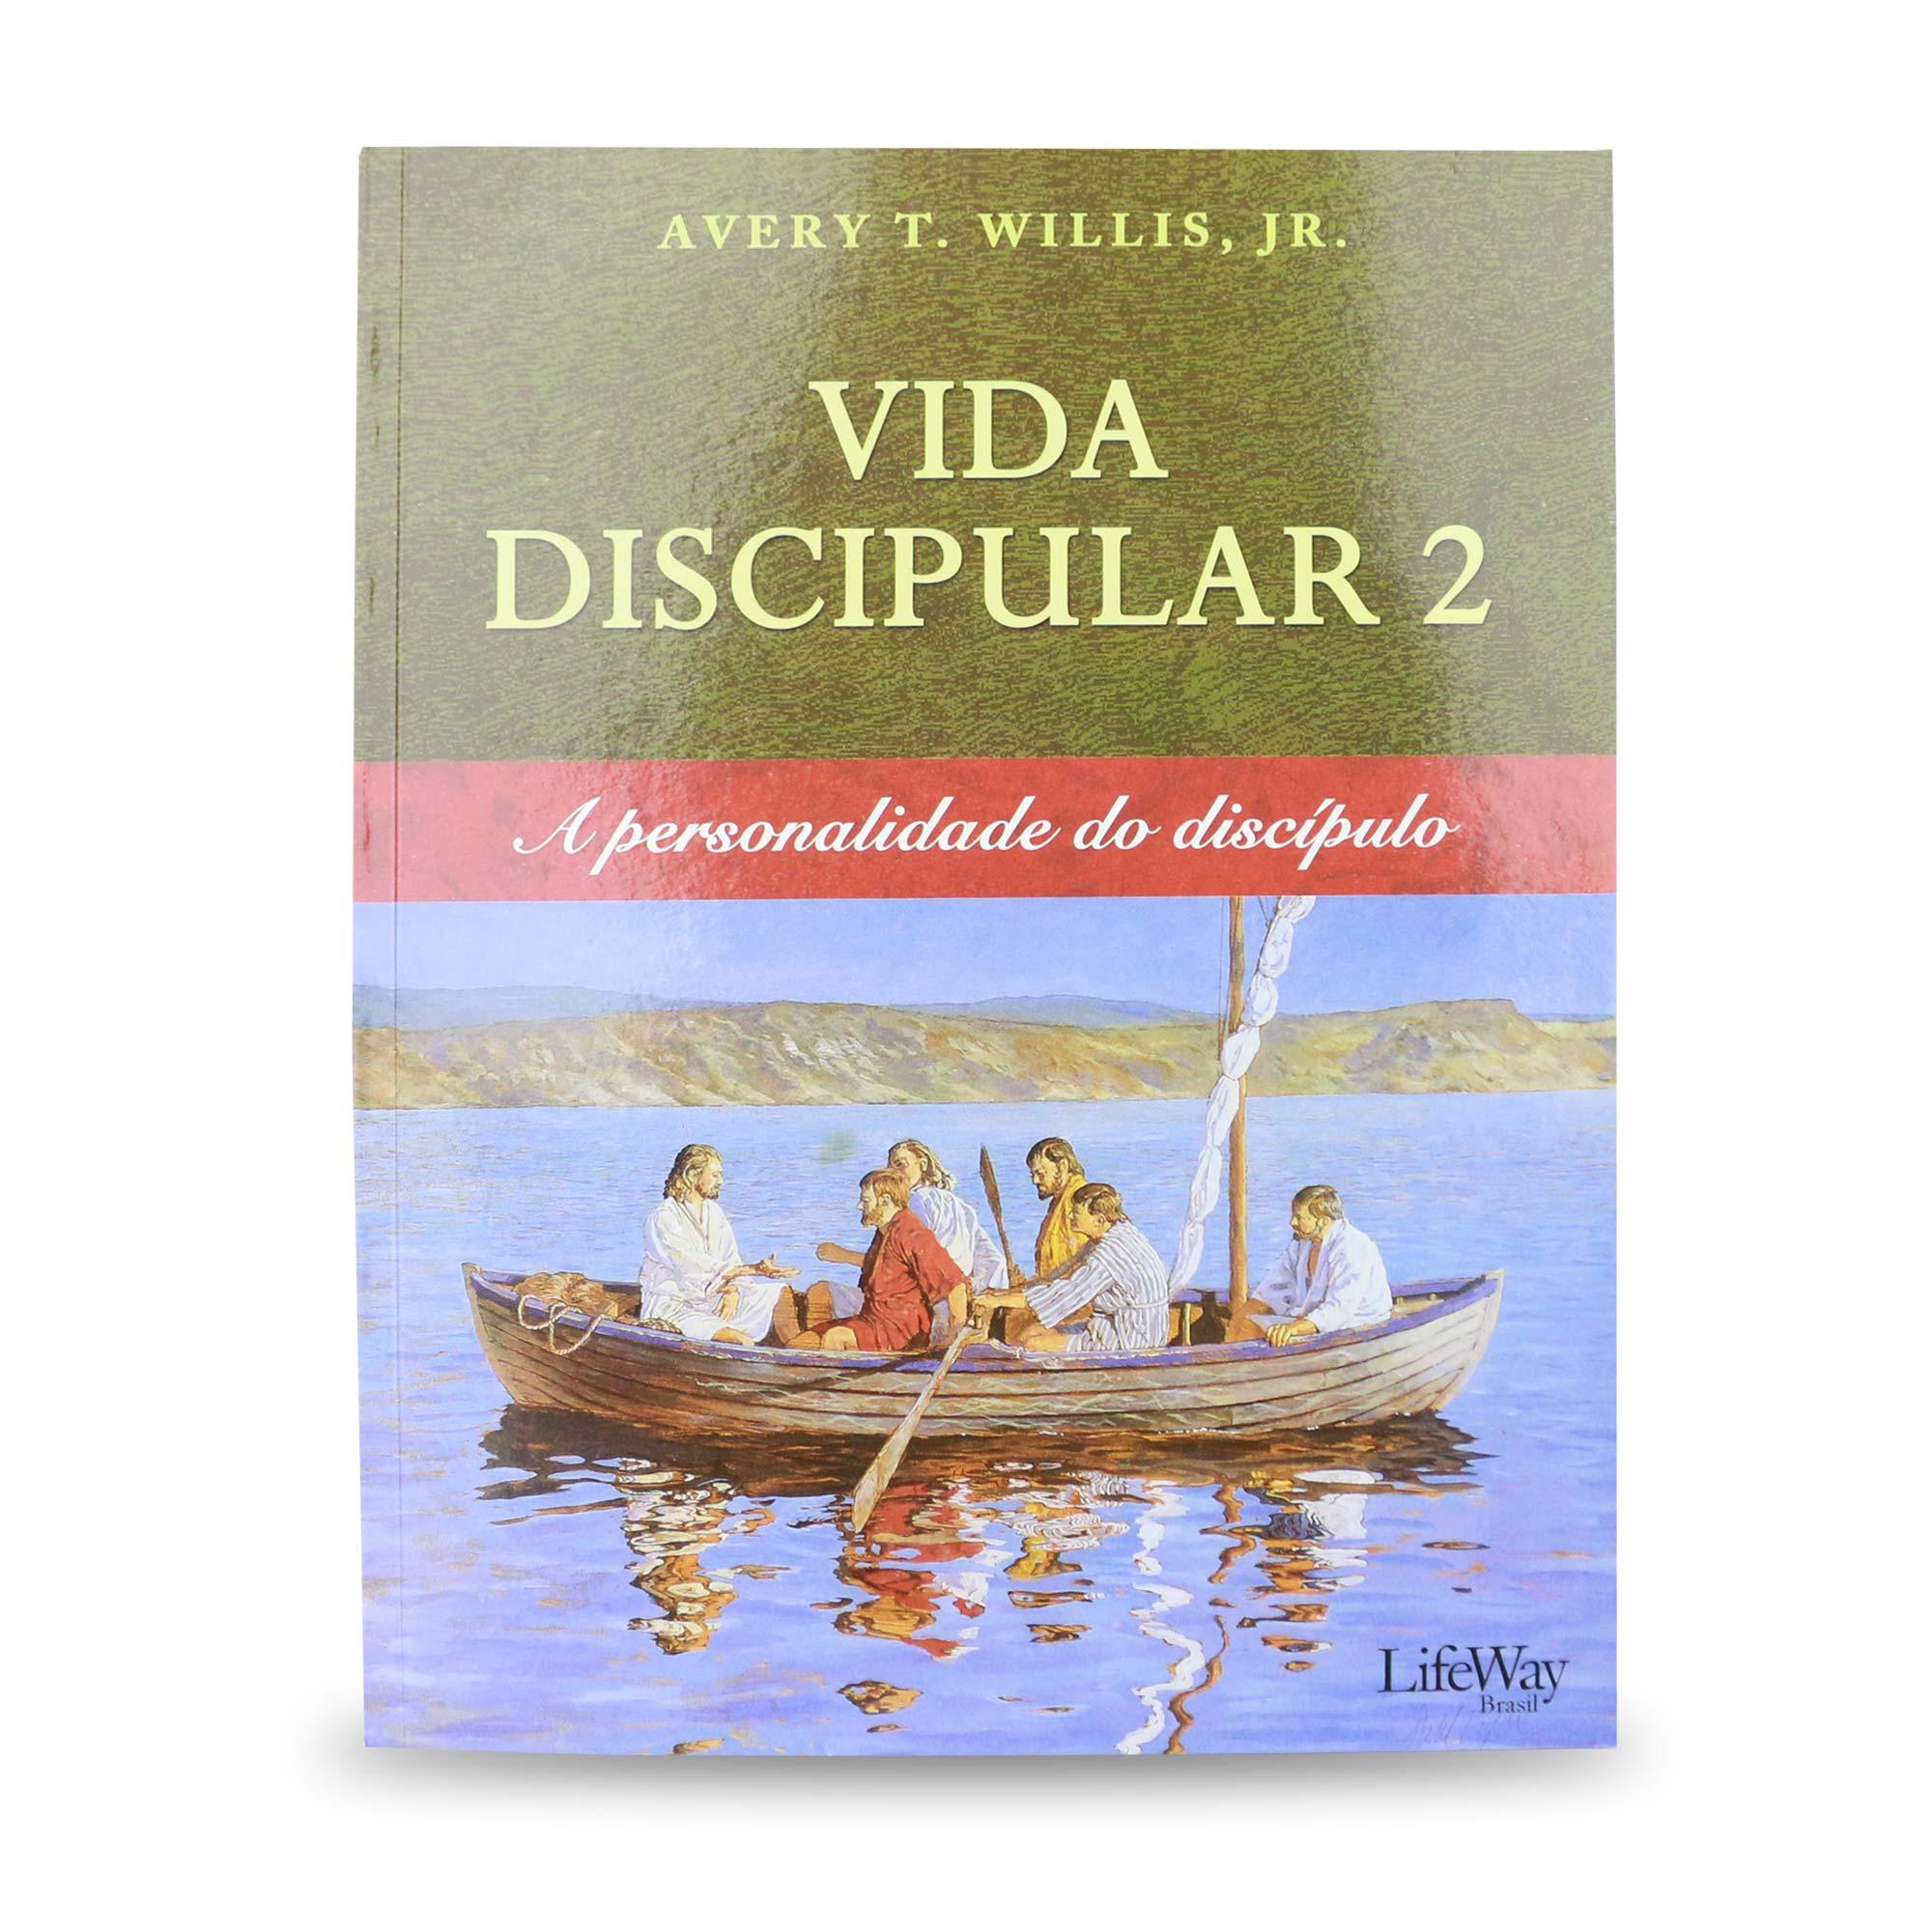 Vida discipular 2, Livro